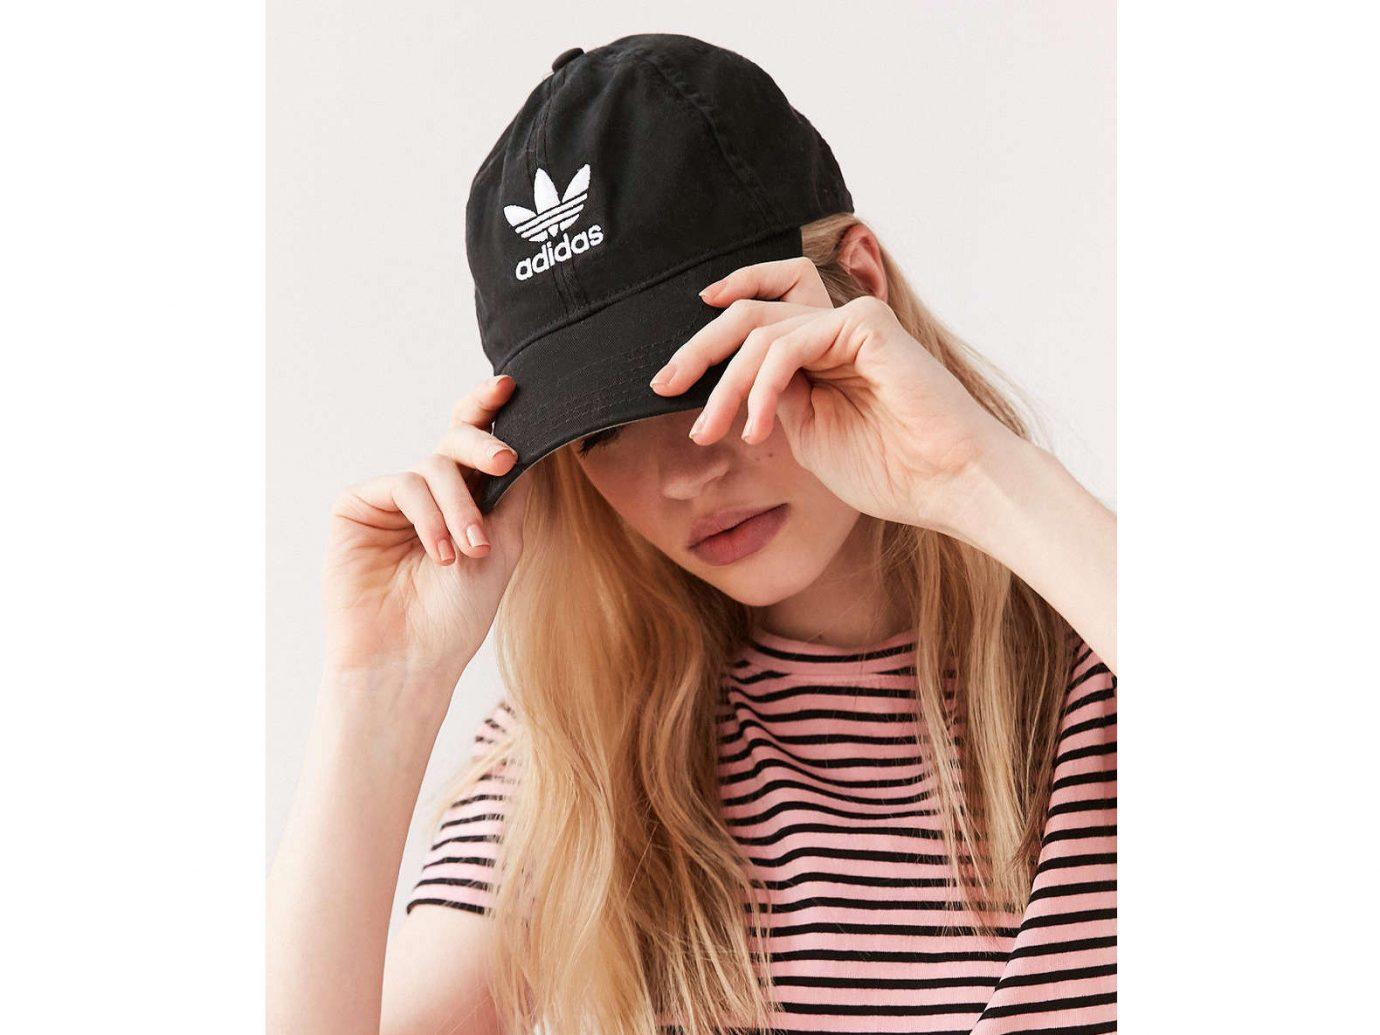 Style + Design Travel Shop person cap clothing headgear beanie wearing sun hat hat knit cap